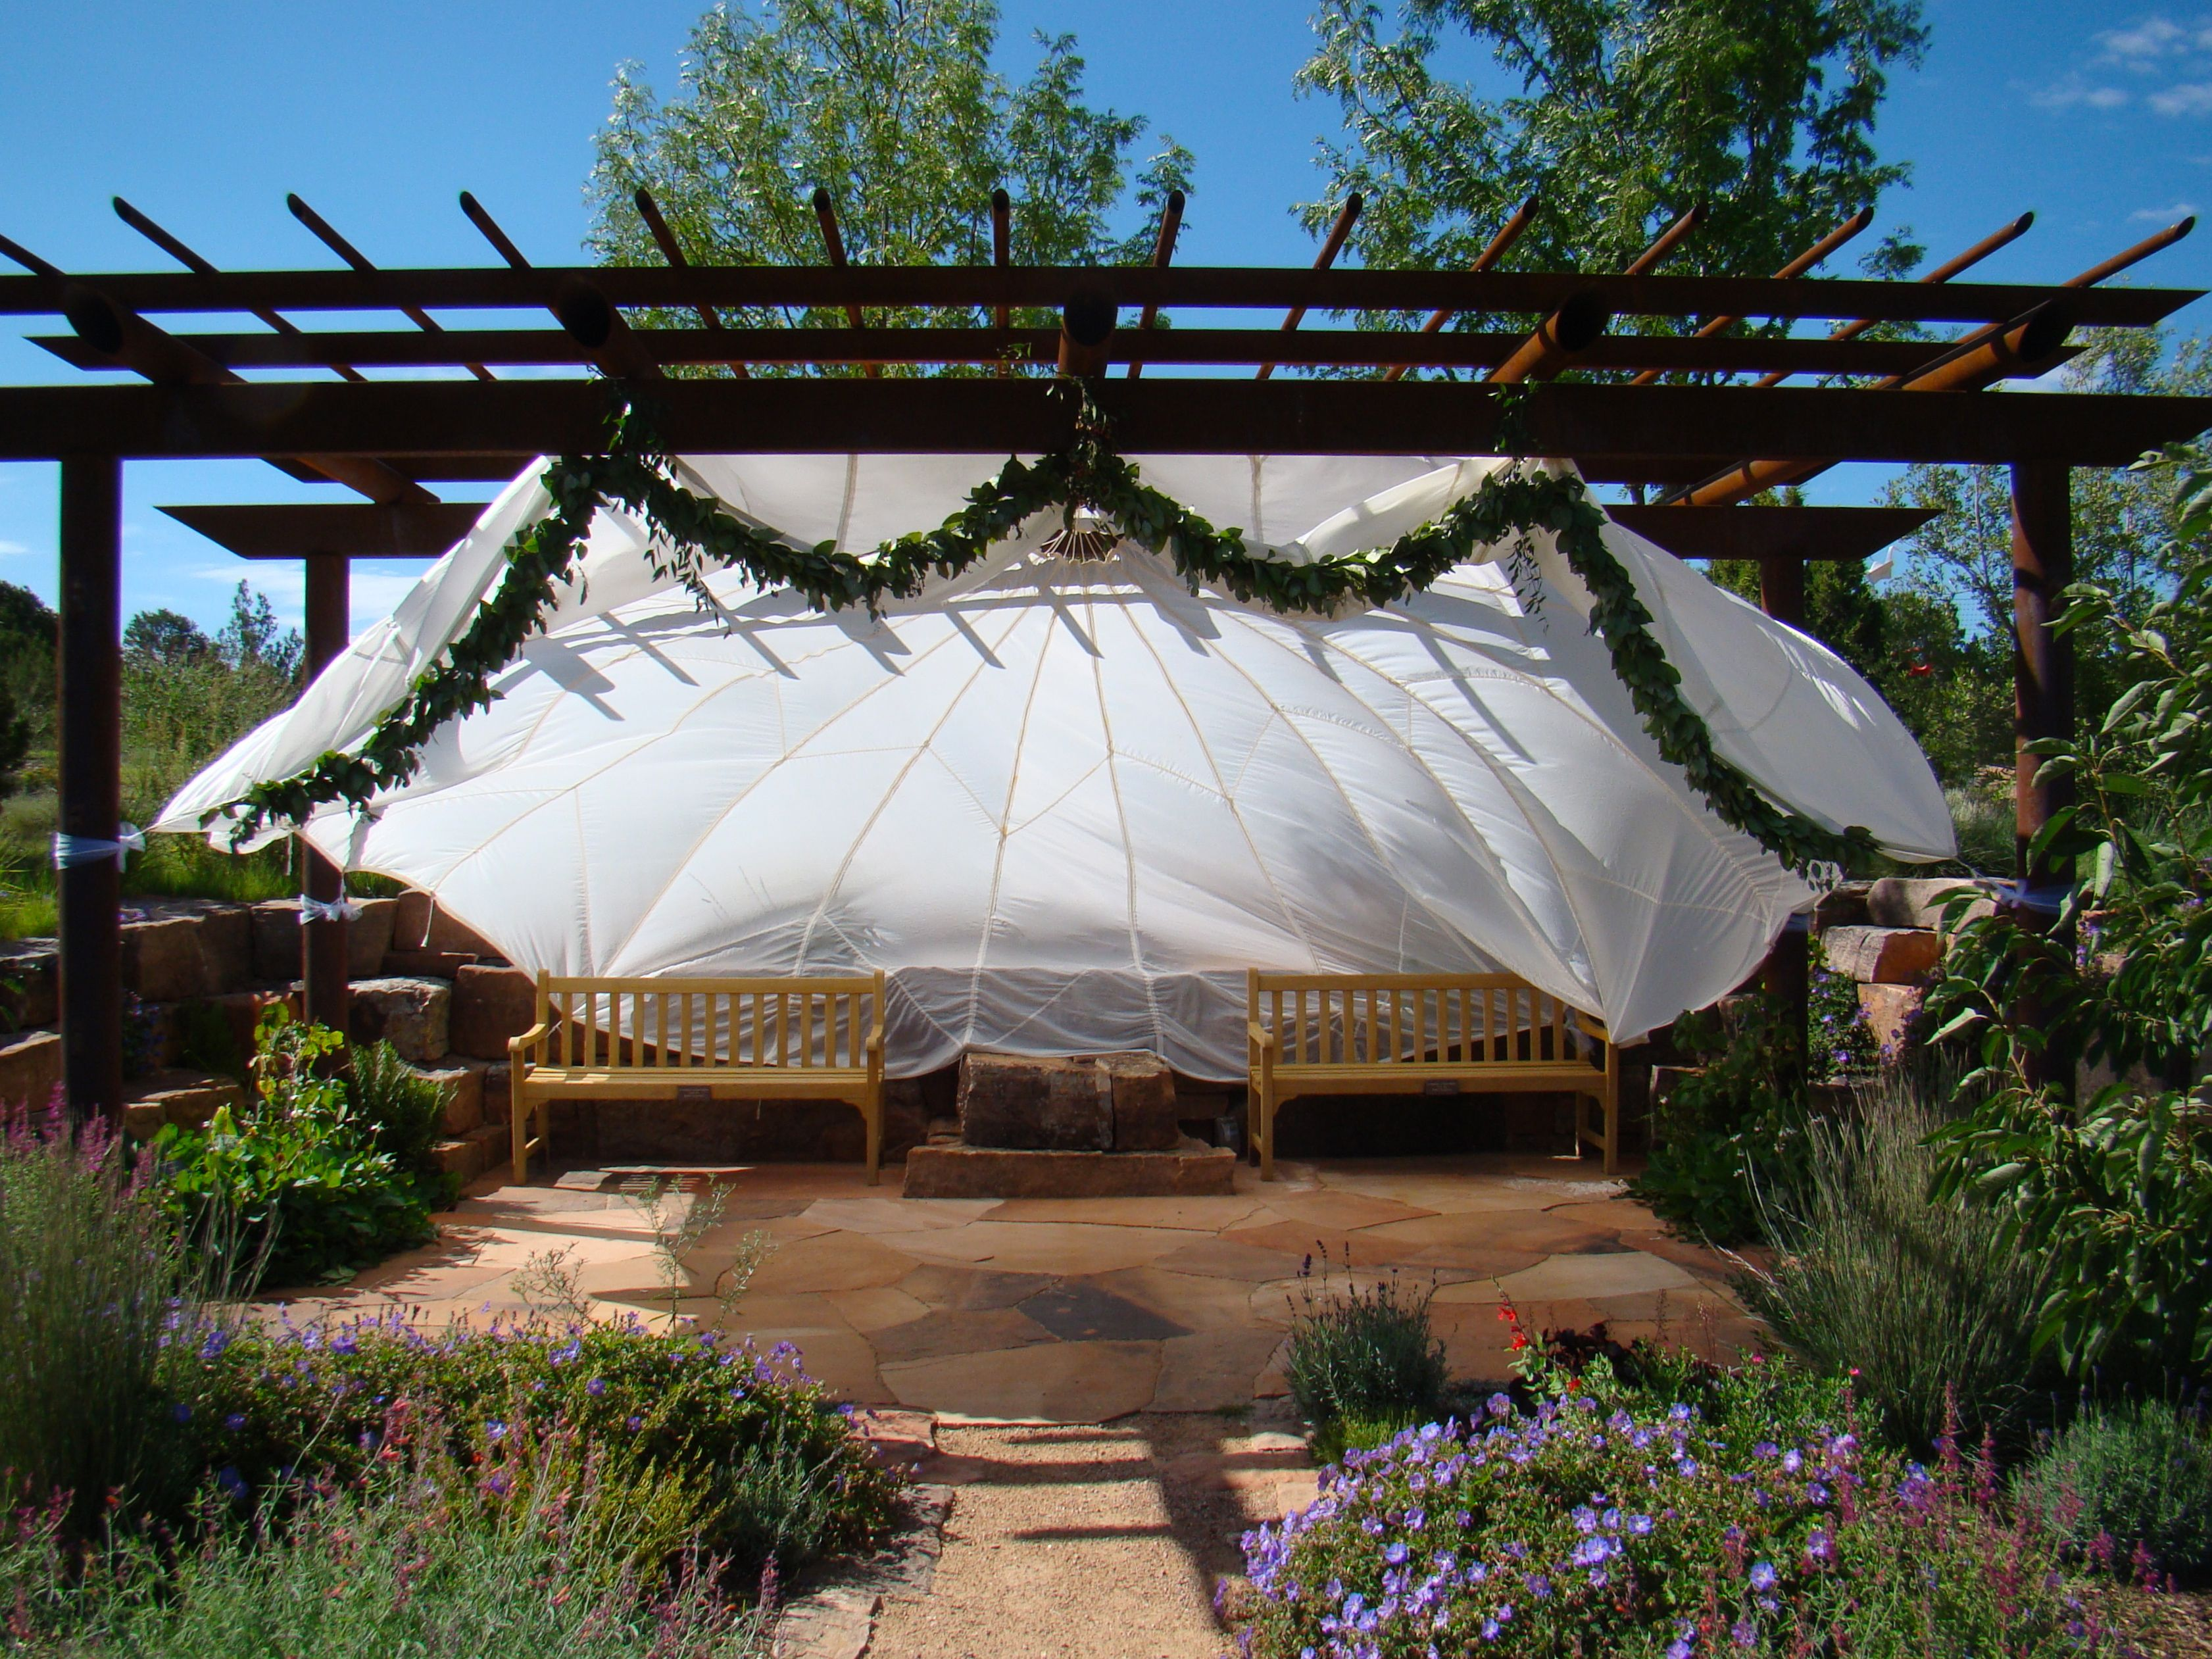 9a471c358f0 Wedding at Santa Fe Botanical Garden  outdoorwedding  marriedinagarden   visitsantafe  nmtrue